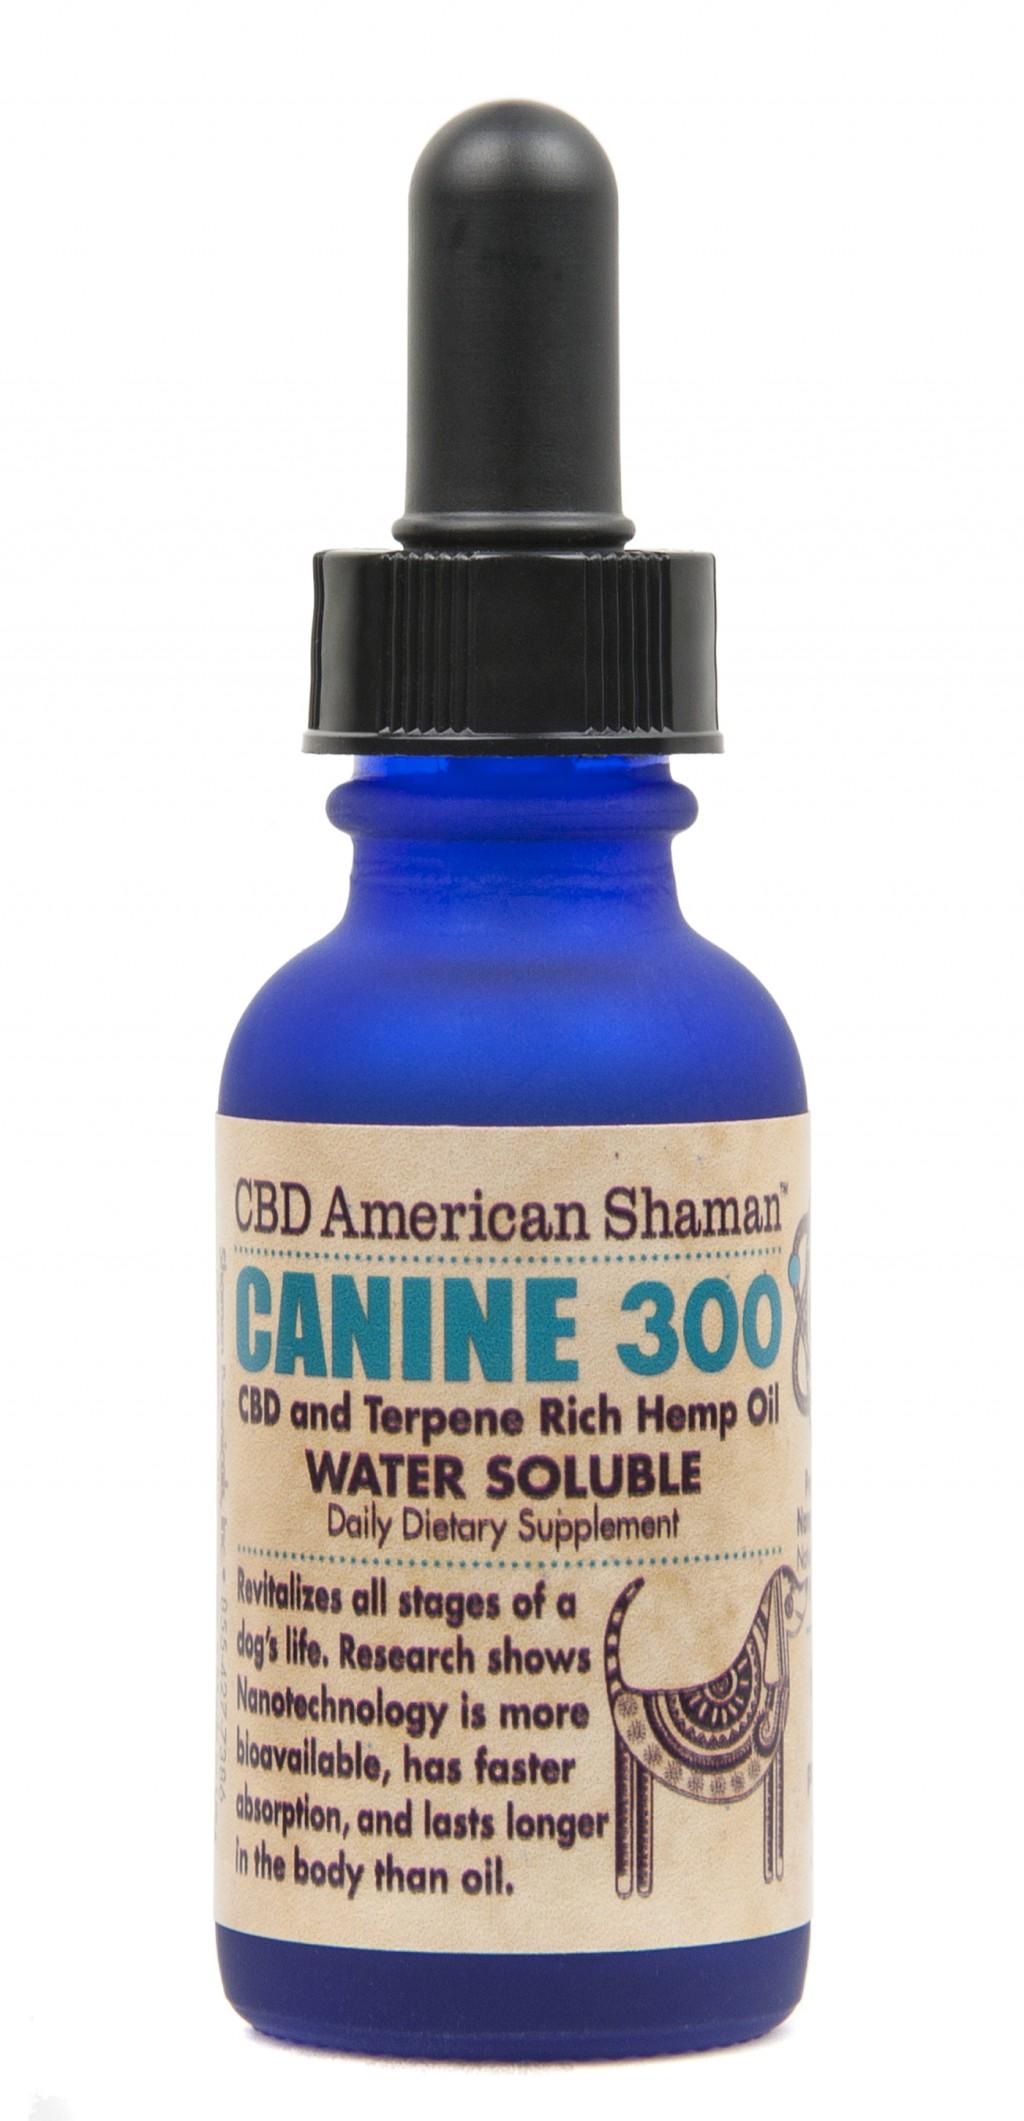 Canine CBD And Terpene Rich Hemp Oil Water Soluble